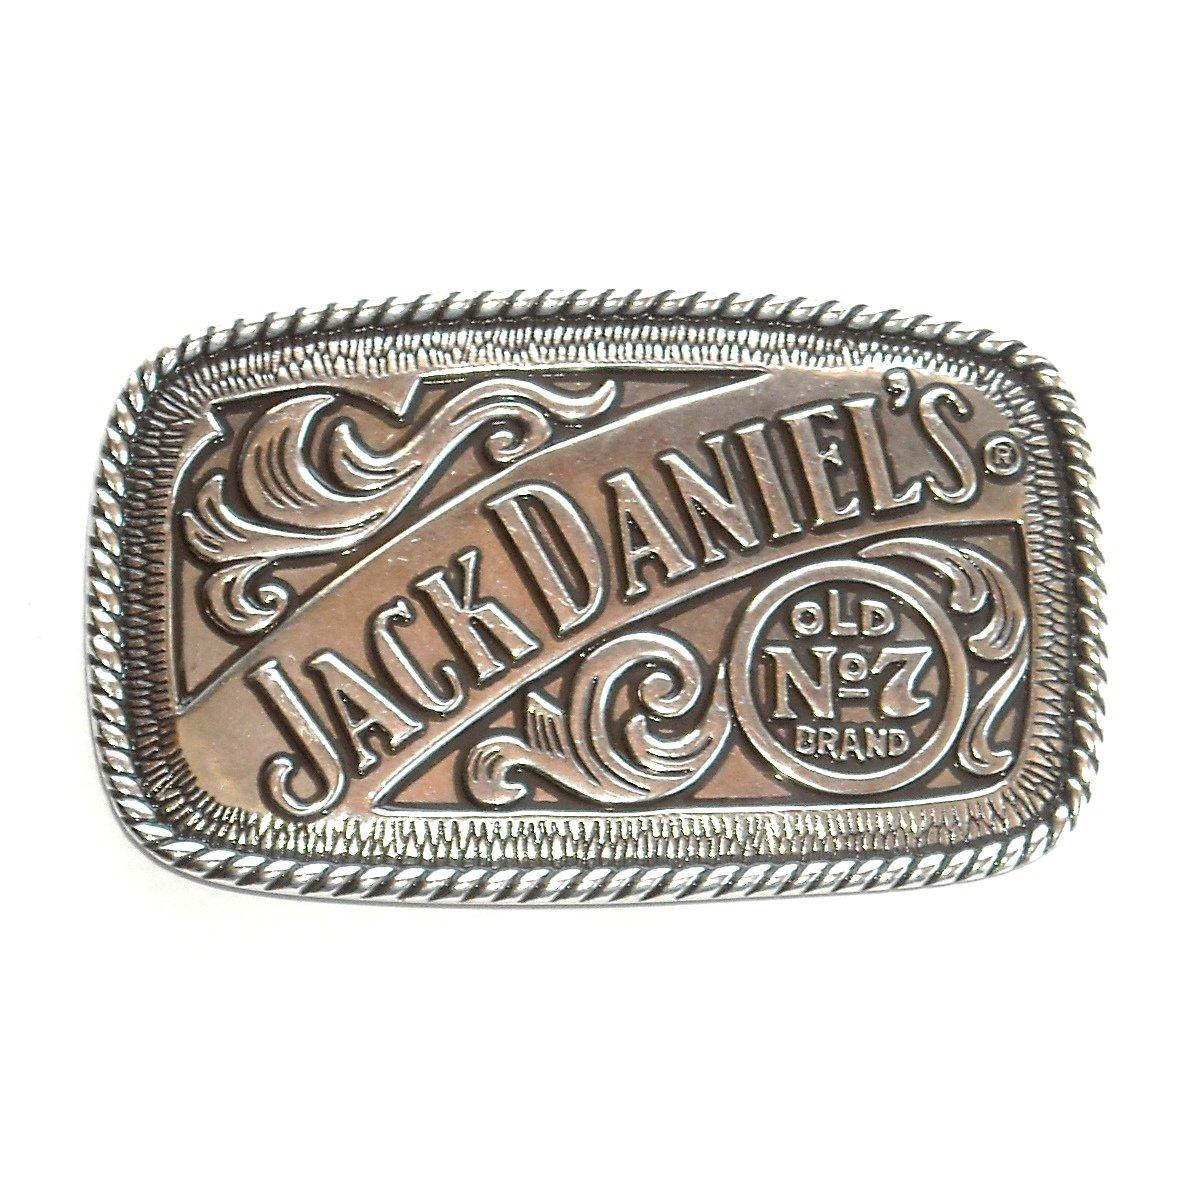 Jack Daniels Old No 7 Whisky Whiskey Belt Buckle